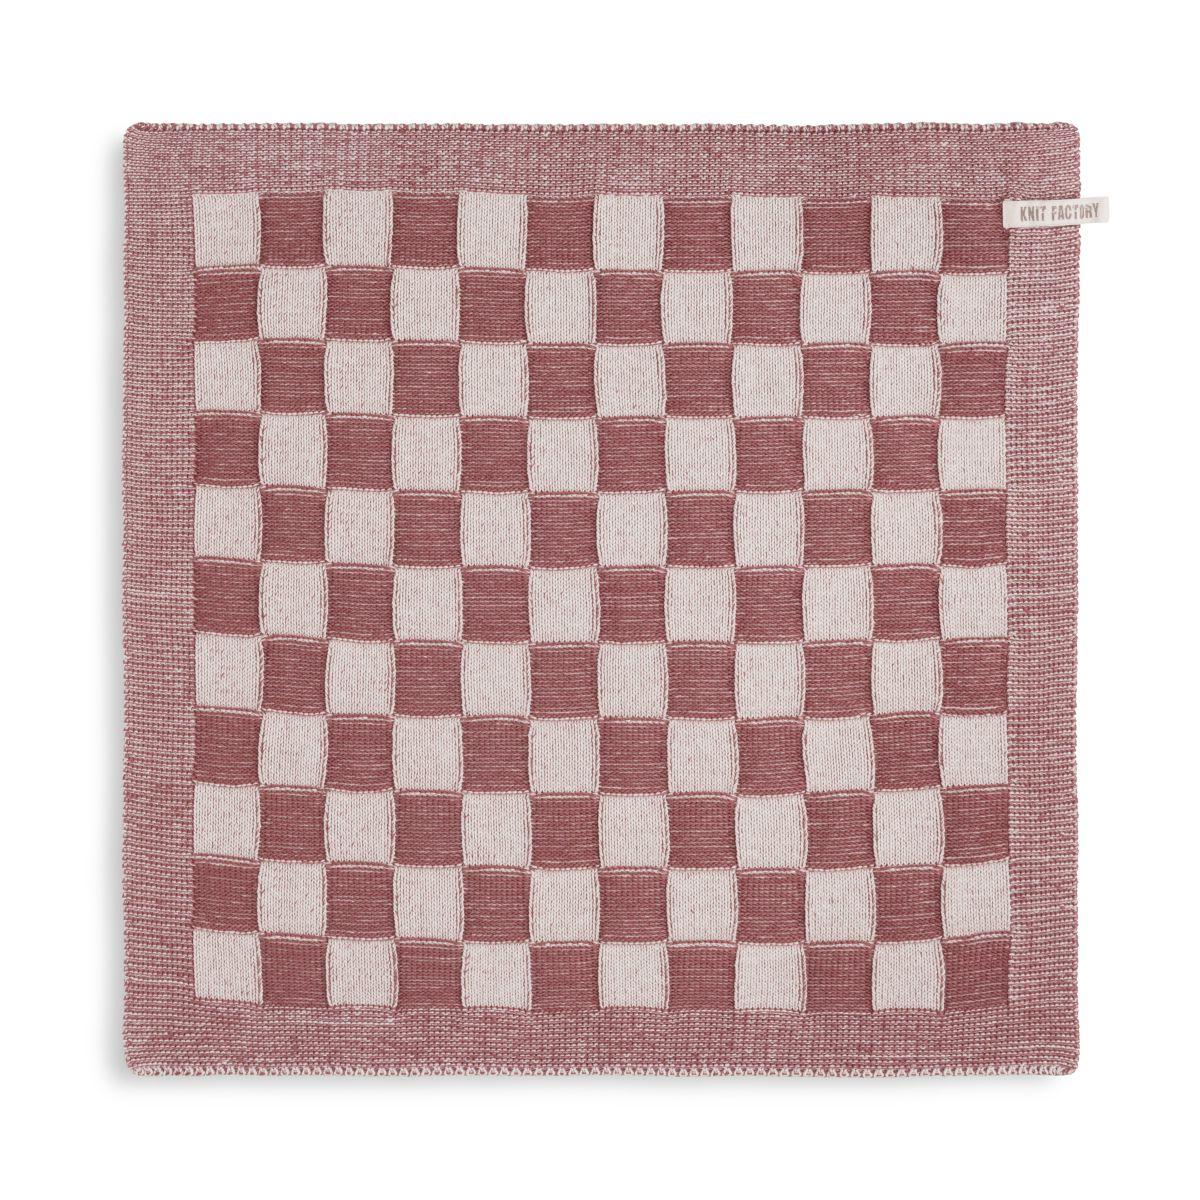 knit factory kf20120028850 keukendoek block ecru stone red 1